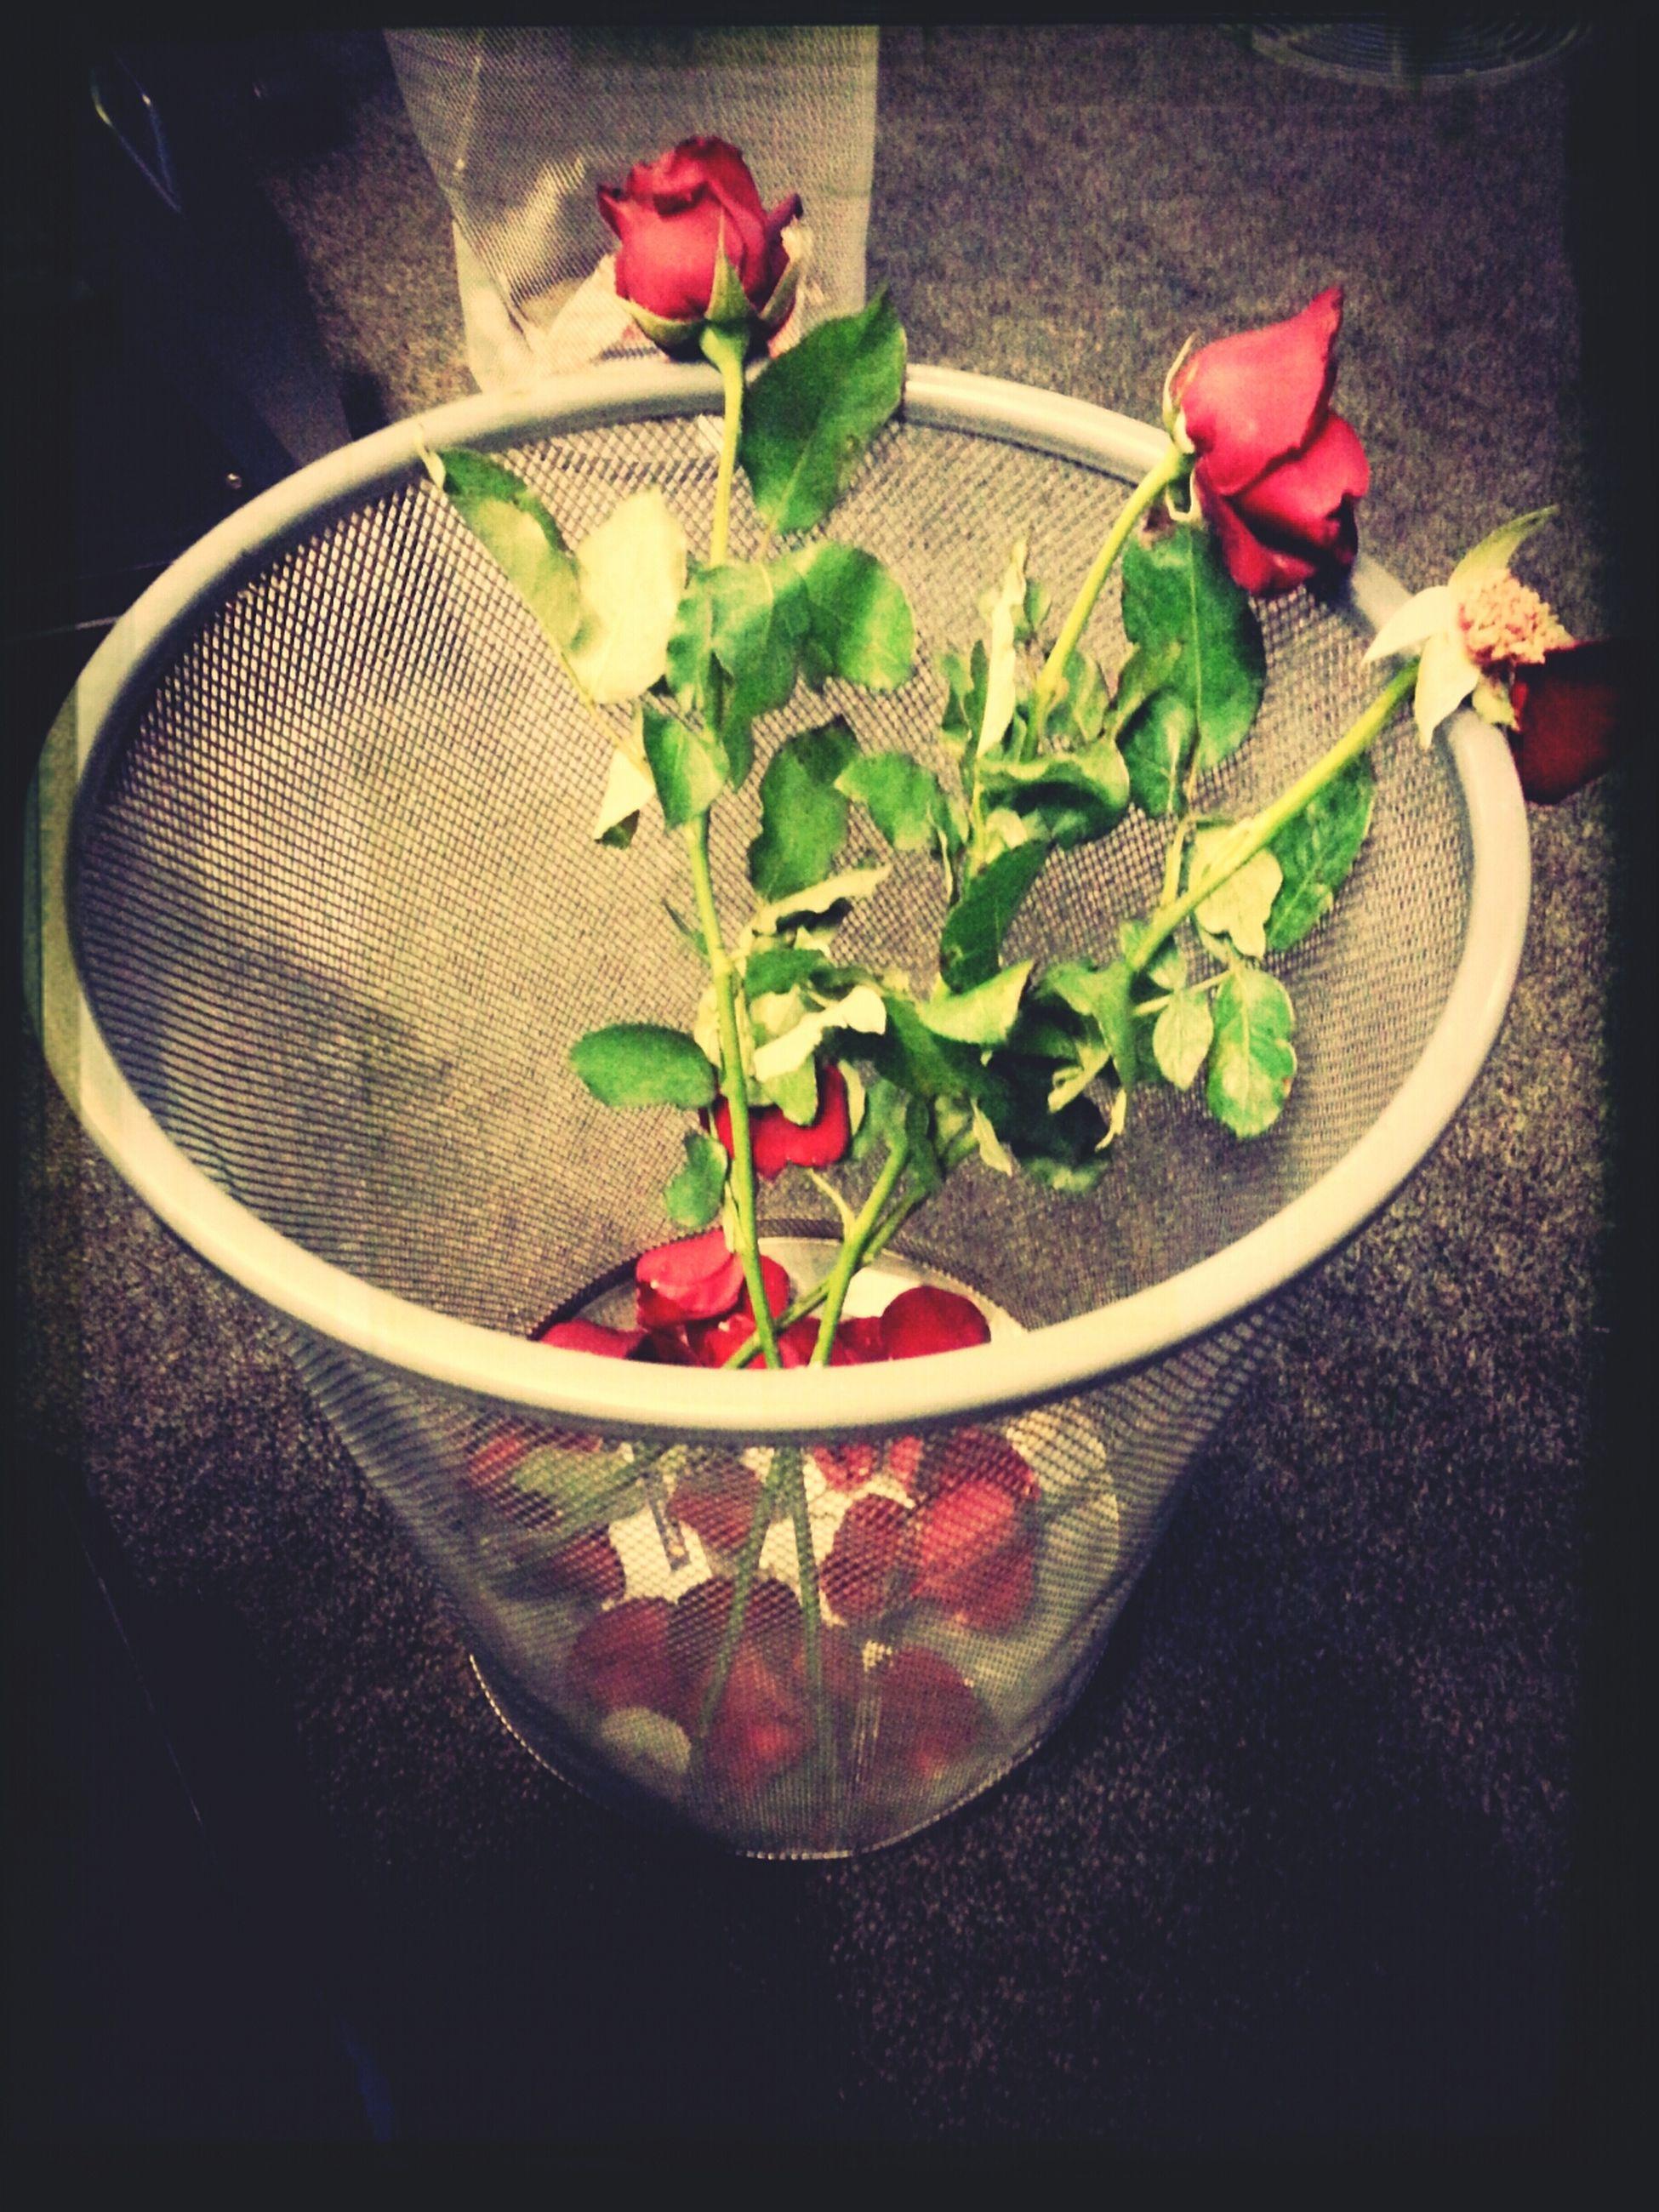 flower, indoors, freshness, vase, fragility, potted plant, plant, petal, rose - flower, table, growth, flower head, leaf, transfer print, flower pot, pink color, decoration, close-up, home interior, nature